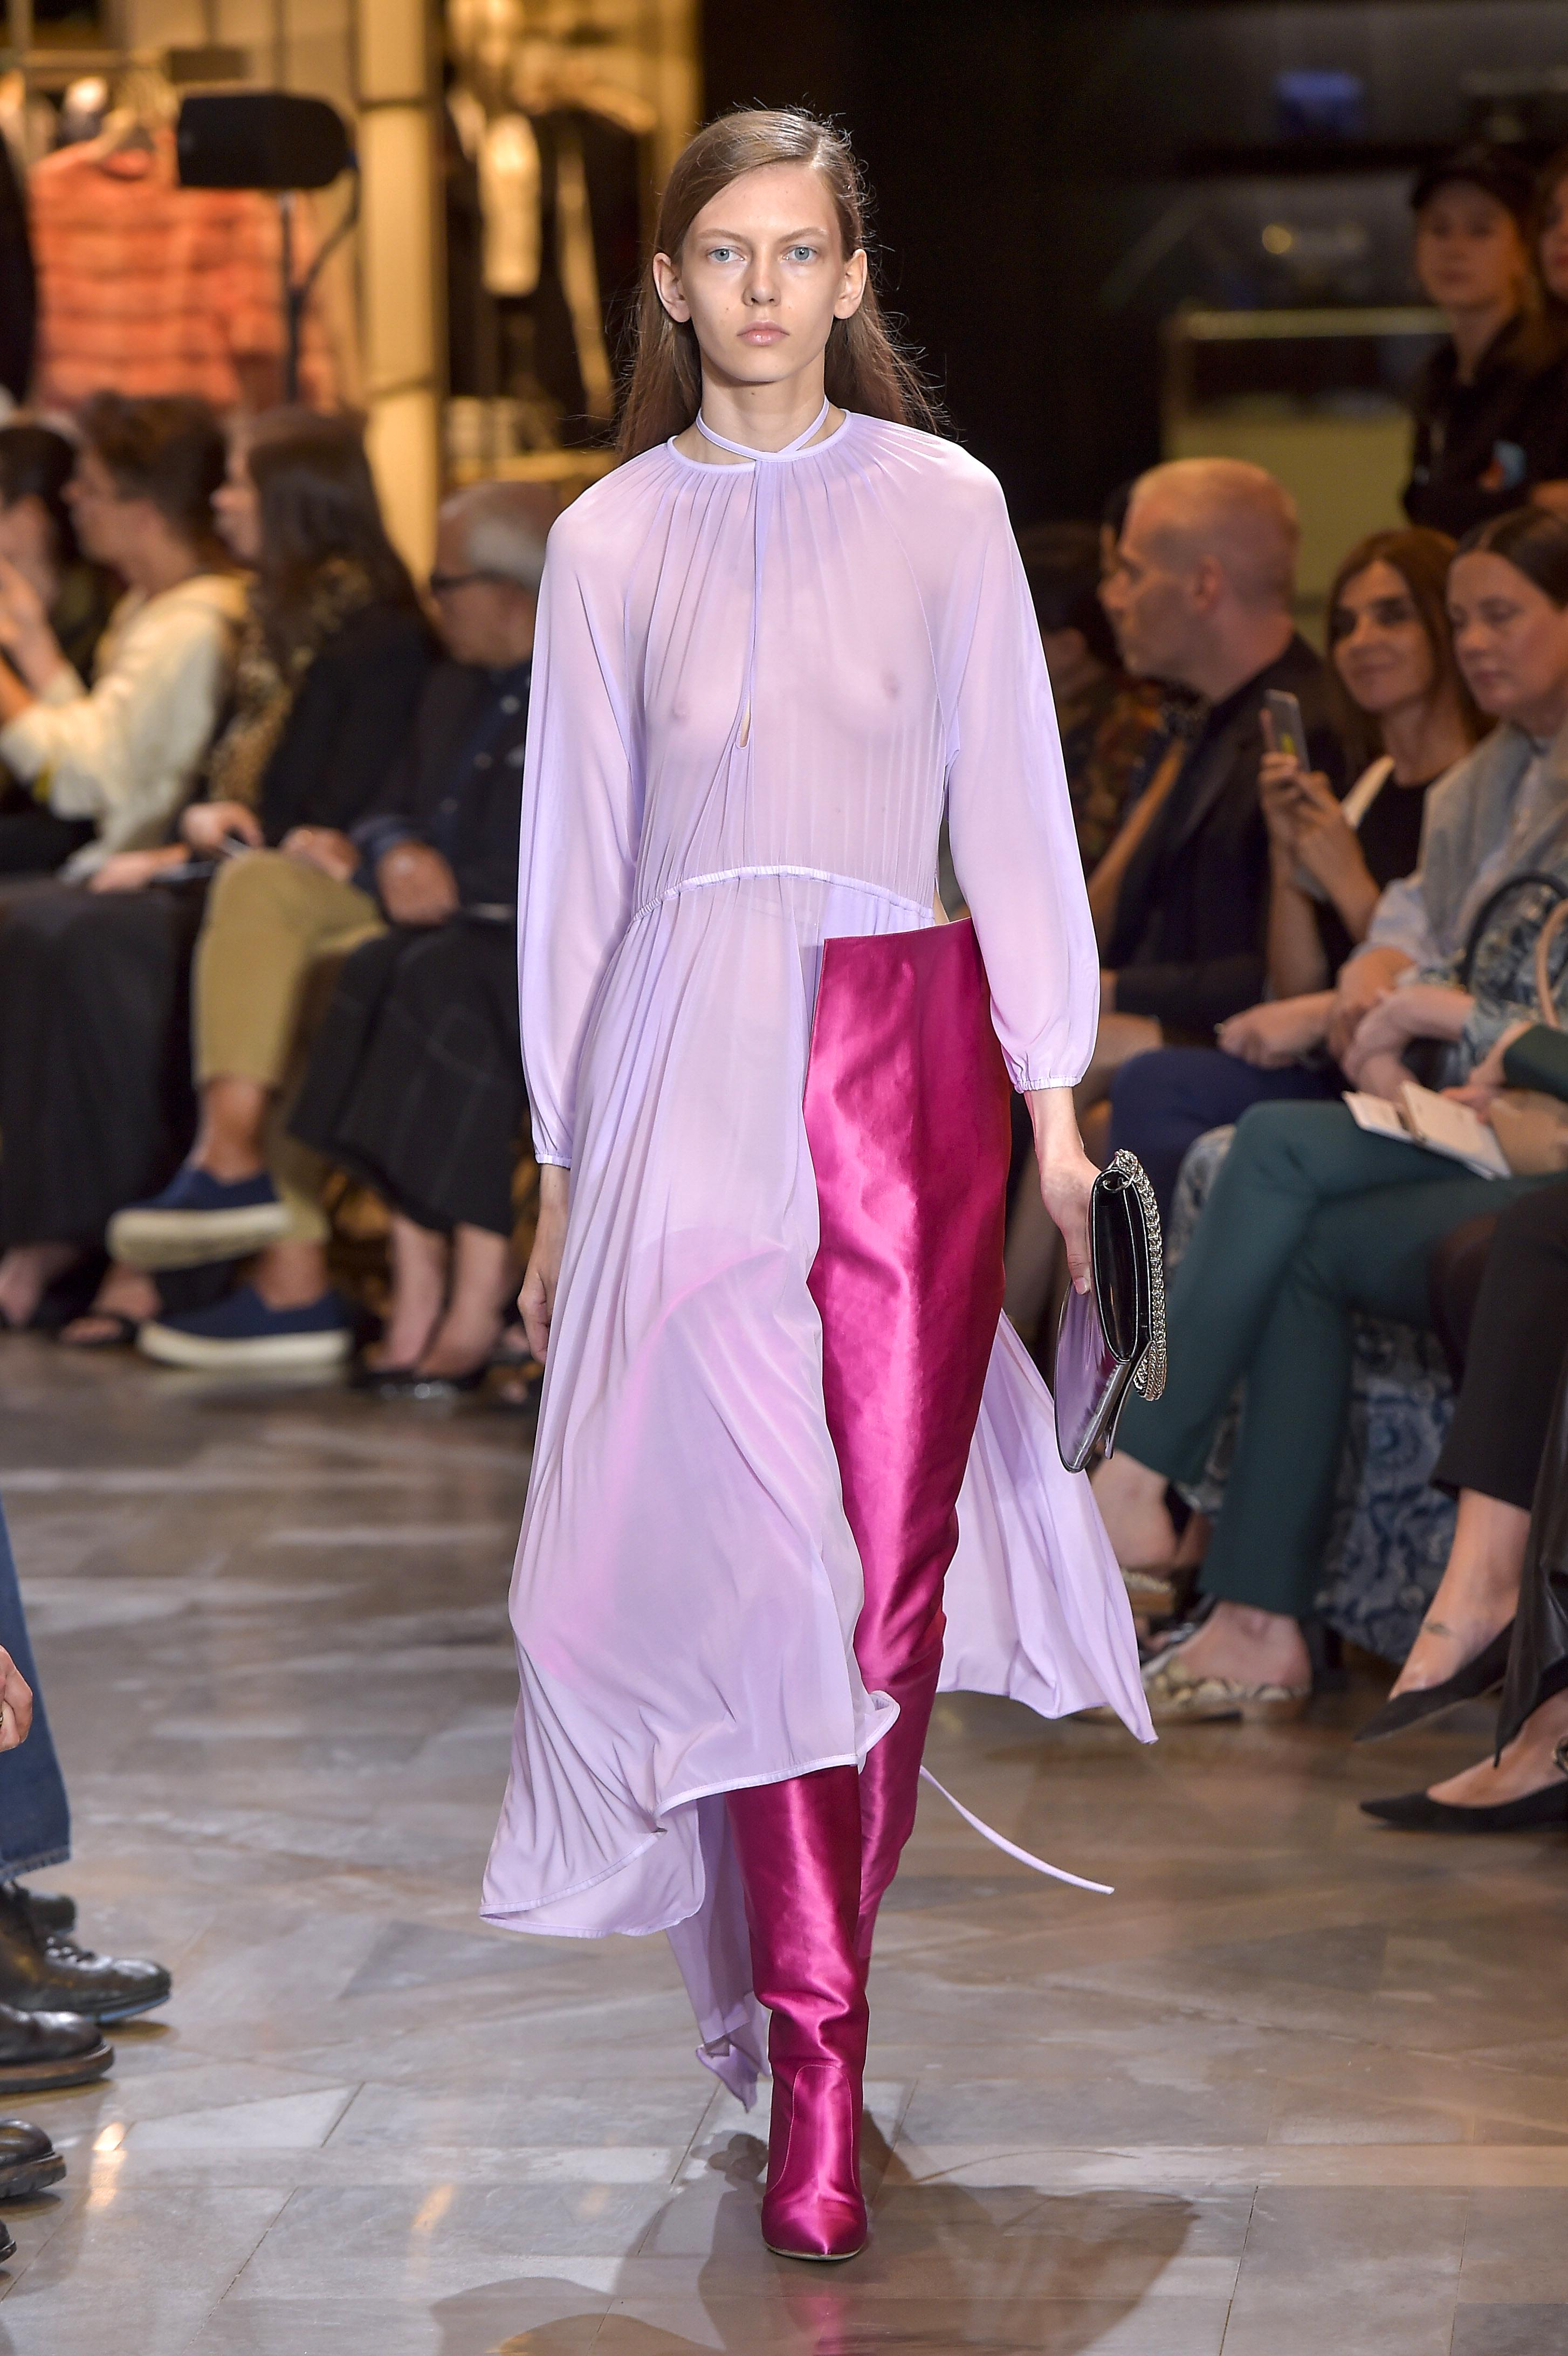 Model on the catwalkVetements show, Runway, Autumn Winter 2016, Haute Couture Fashion Week, Paris, France - 03 Jul 2016